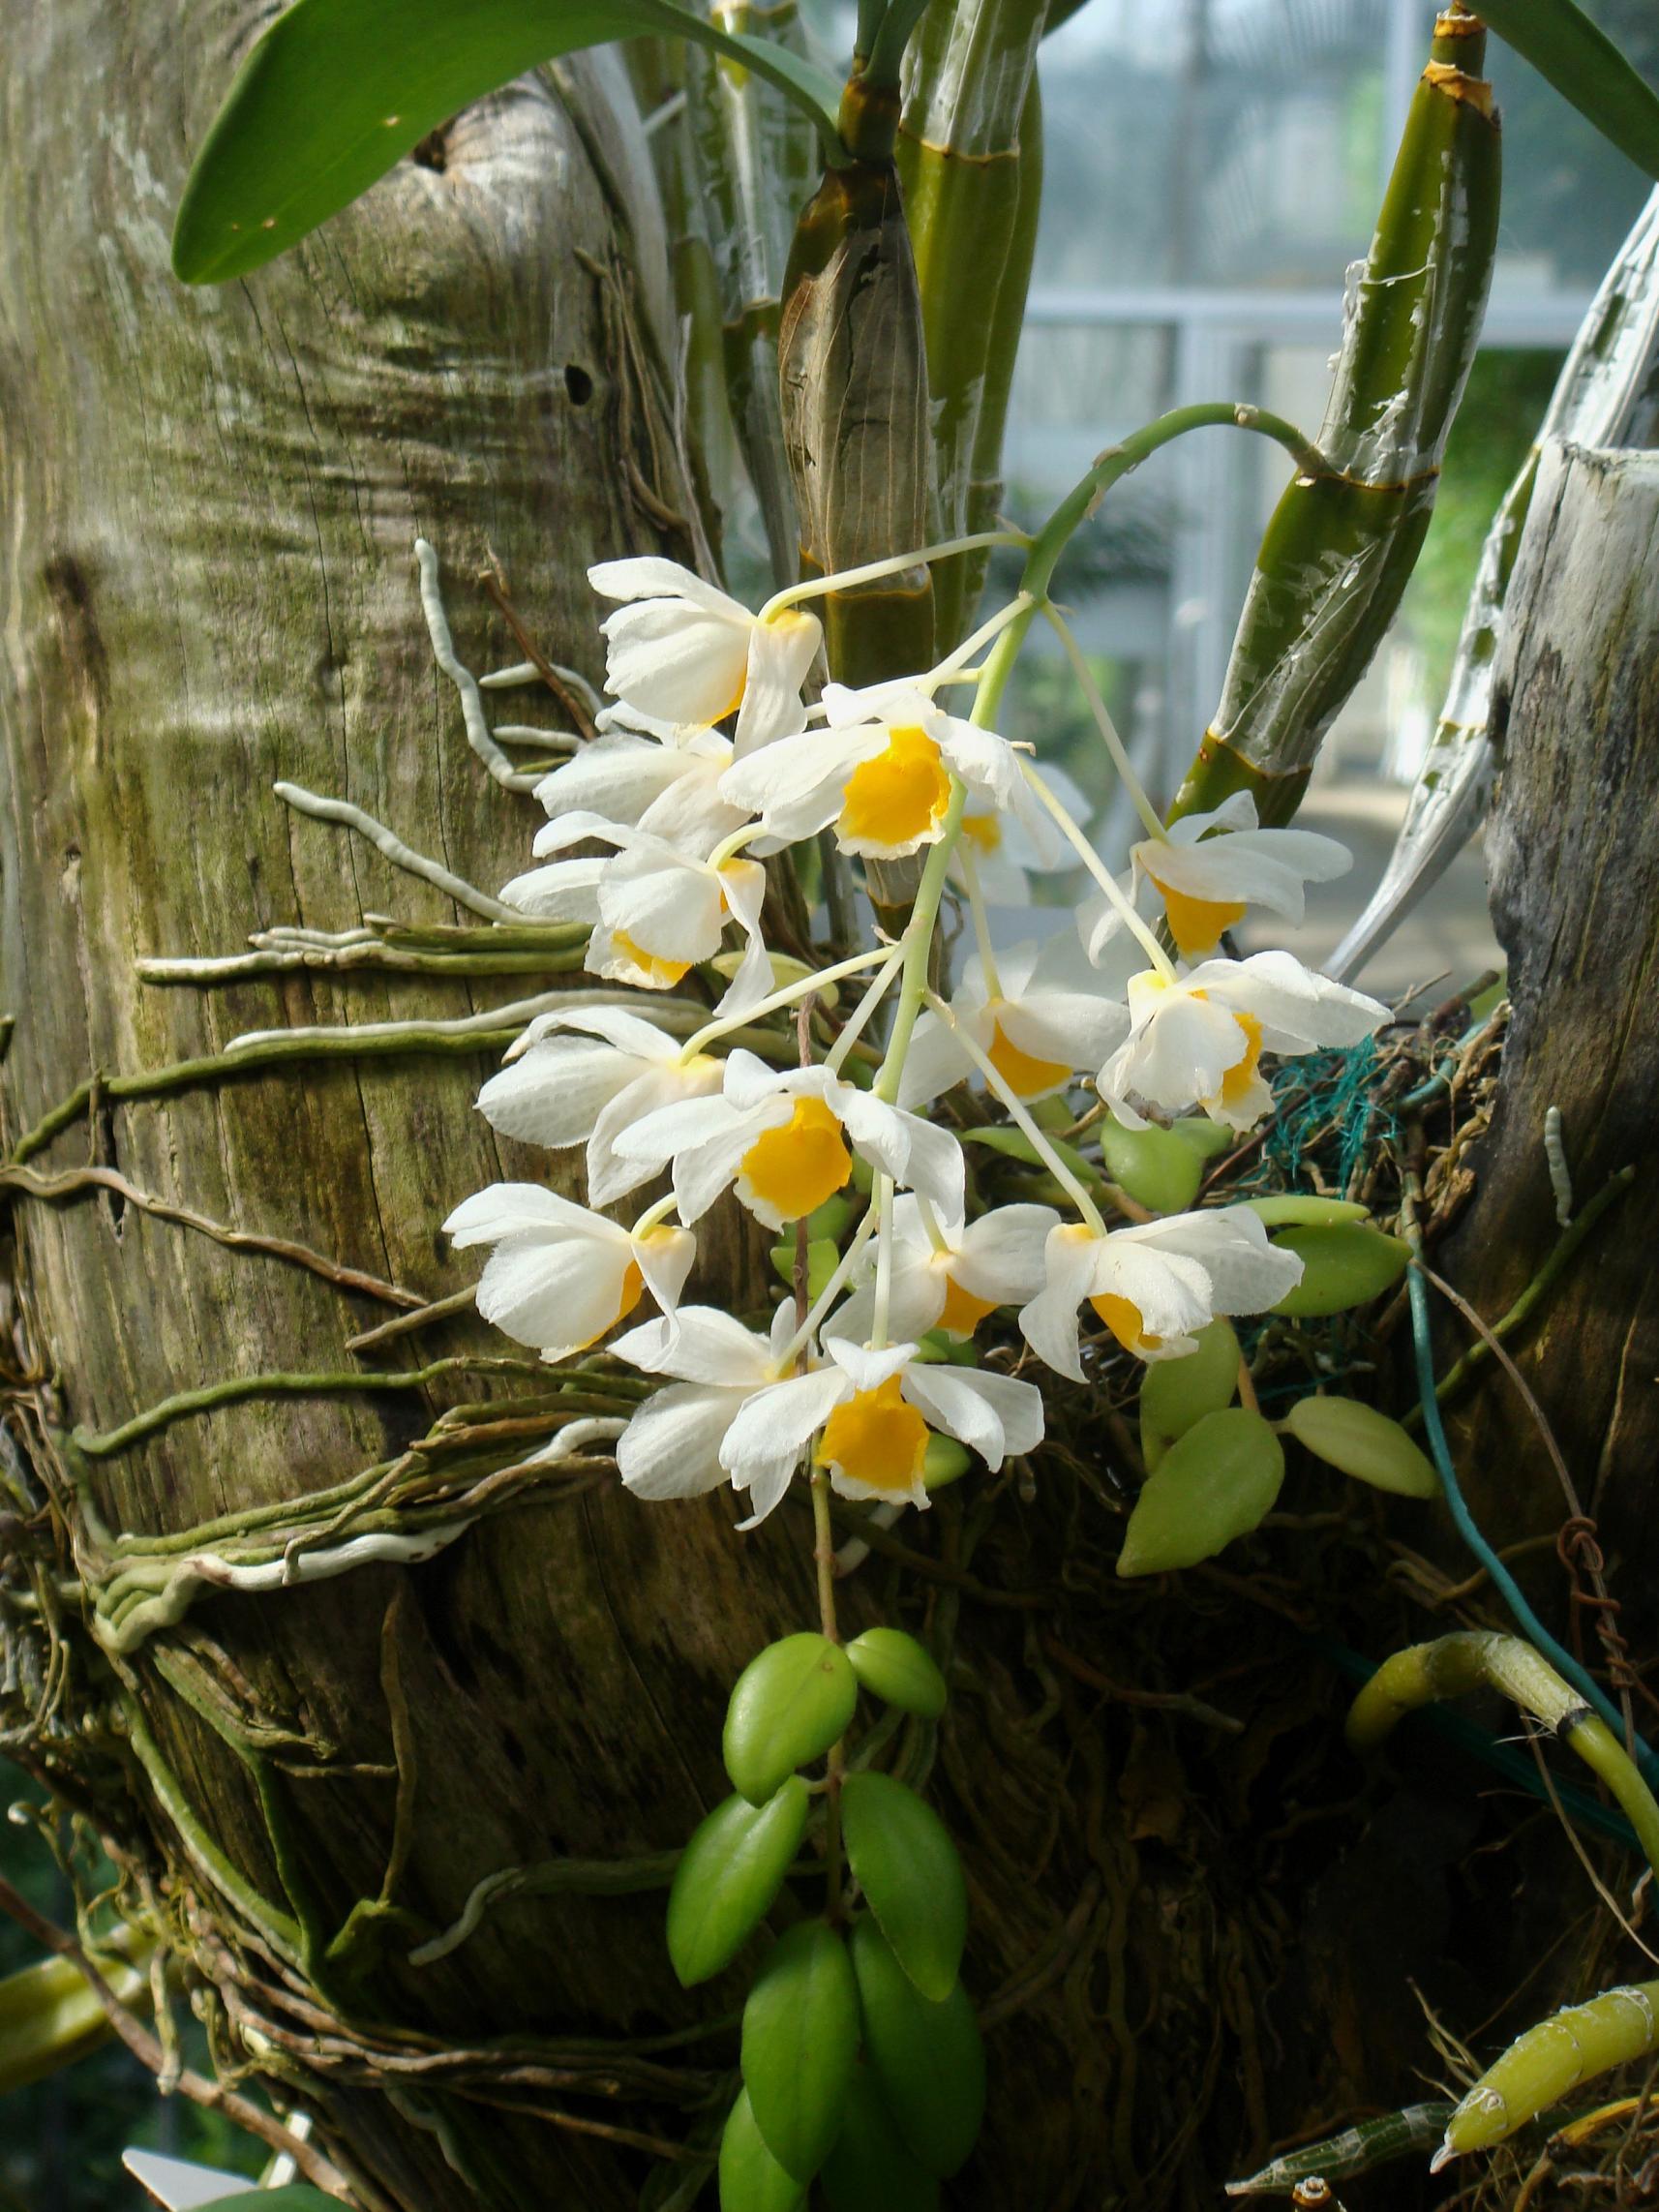 http://orchids.la.coocan.jp/Dendrobium/Dendrobium%20palpebrae/DSC01218.JPG